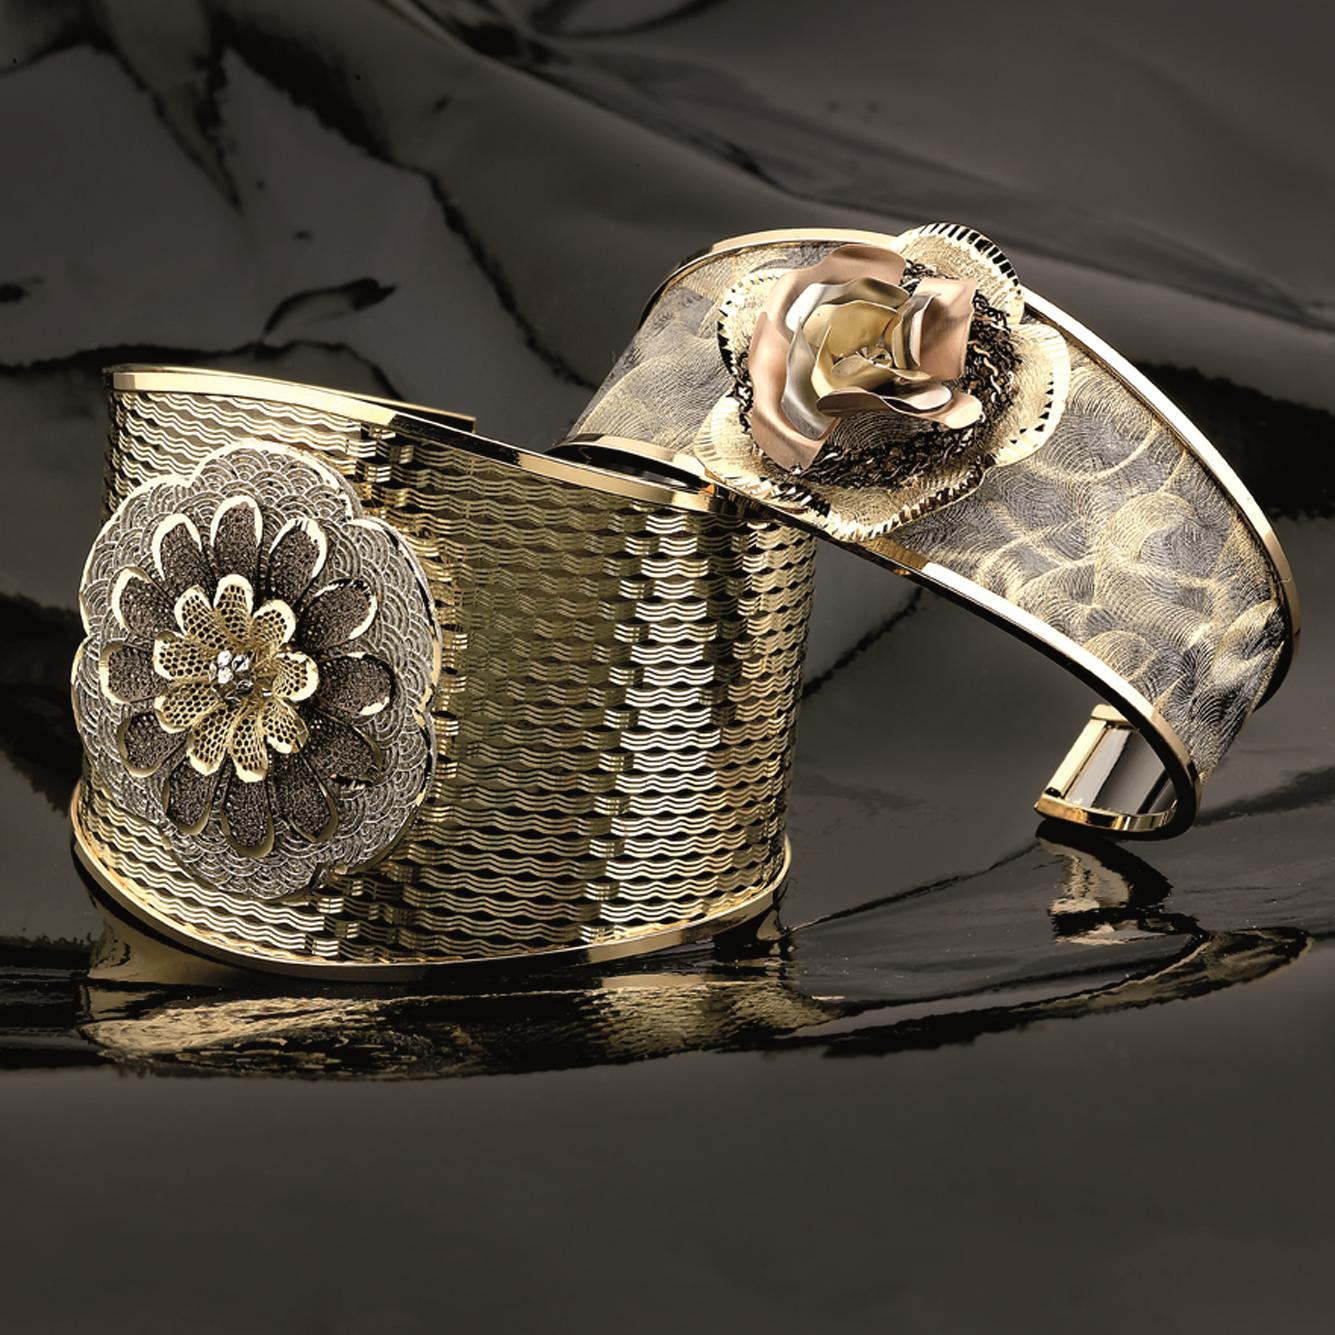 Jewelry News Network Italian Gold Jewelry the Focus of Arezzo